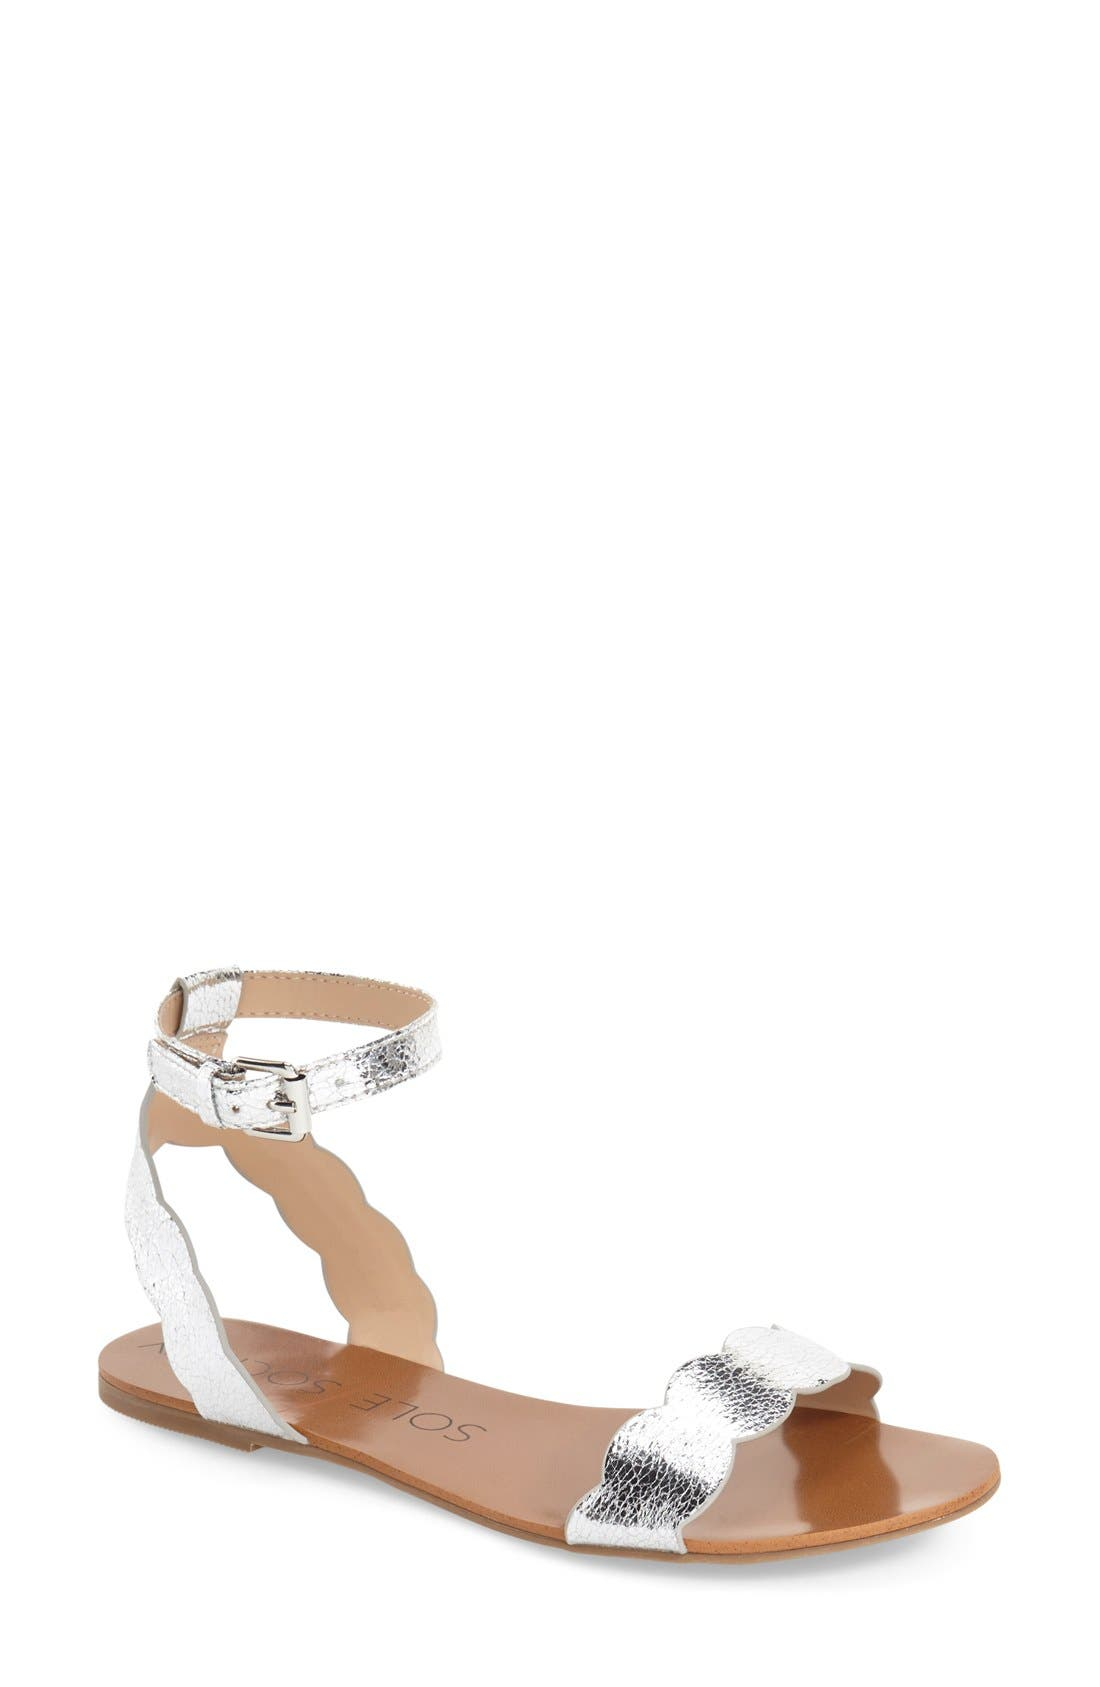 'Odette' Scalloped Ankle Strap Flat Sandal,                             Main thumbnail 4, color,